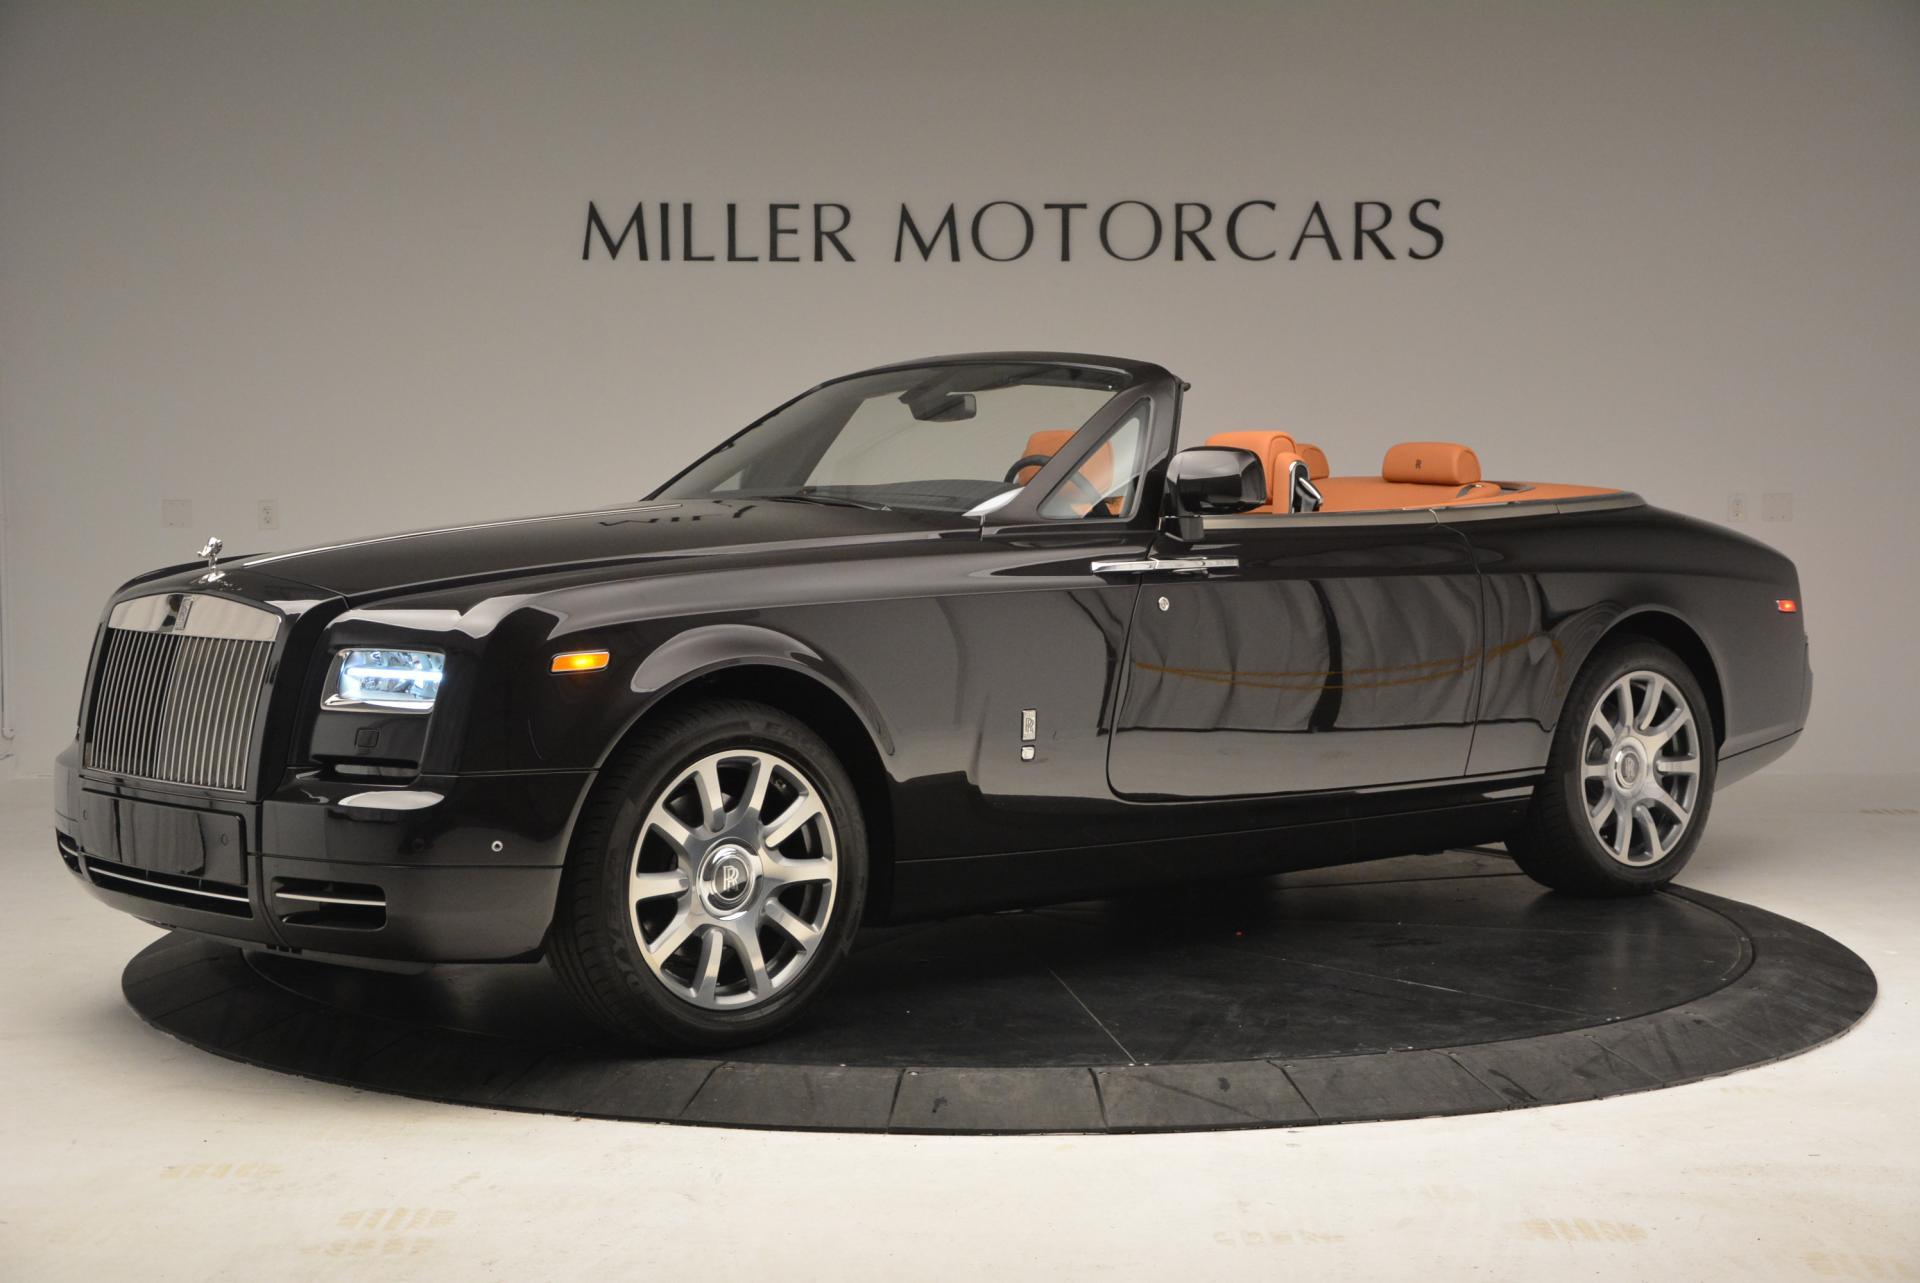 New 2016 Rolls Royce Phantom Drophead Coupe Bespoke